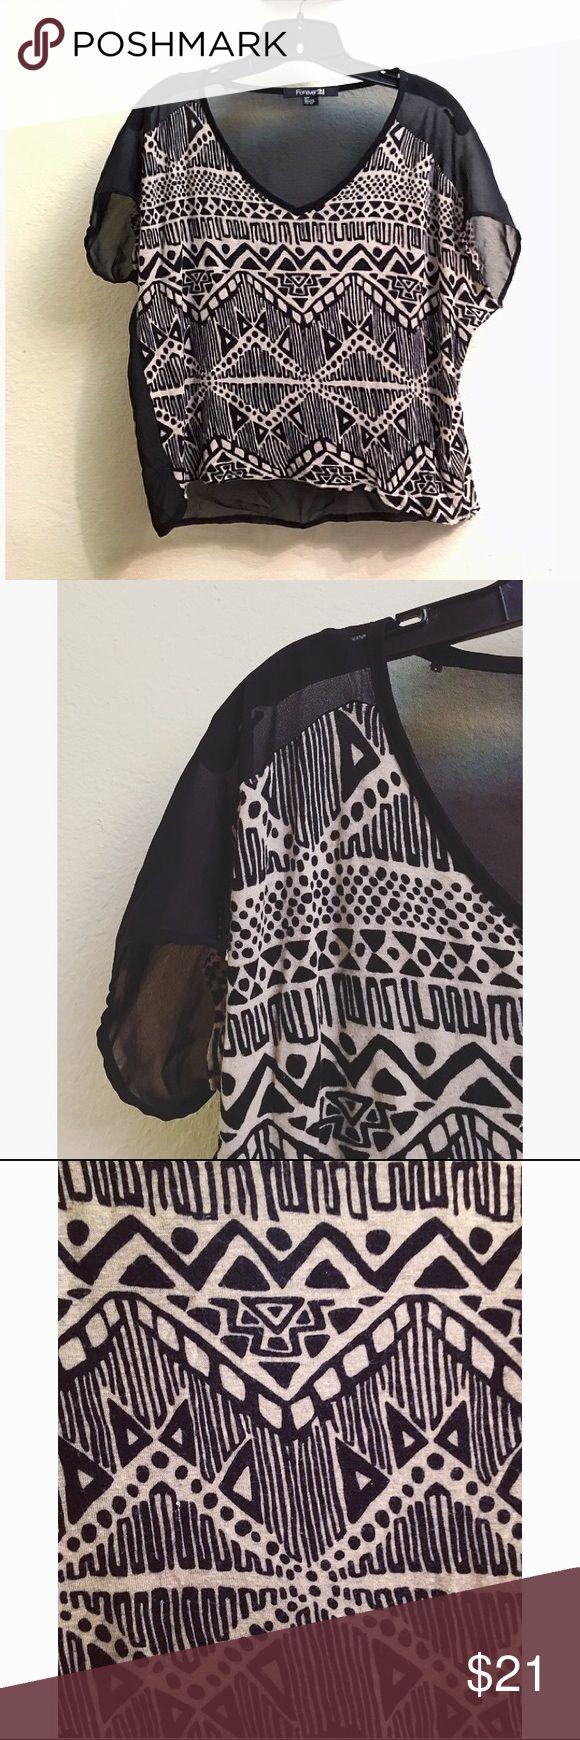 Tribal Top Tribal black n cream top with sheer seethrough back Tops Blouses